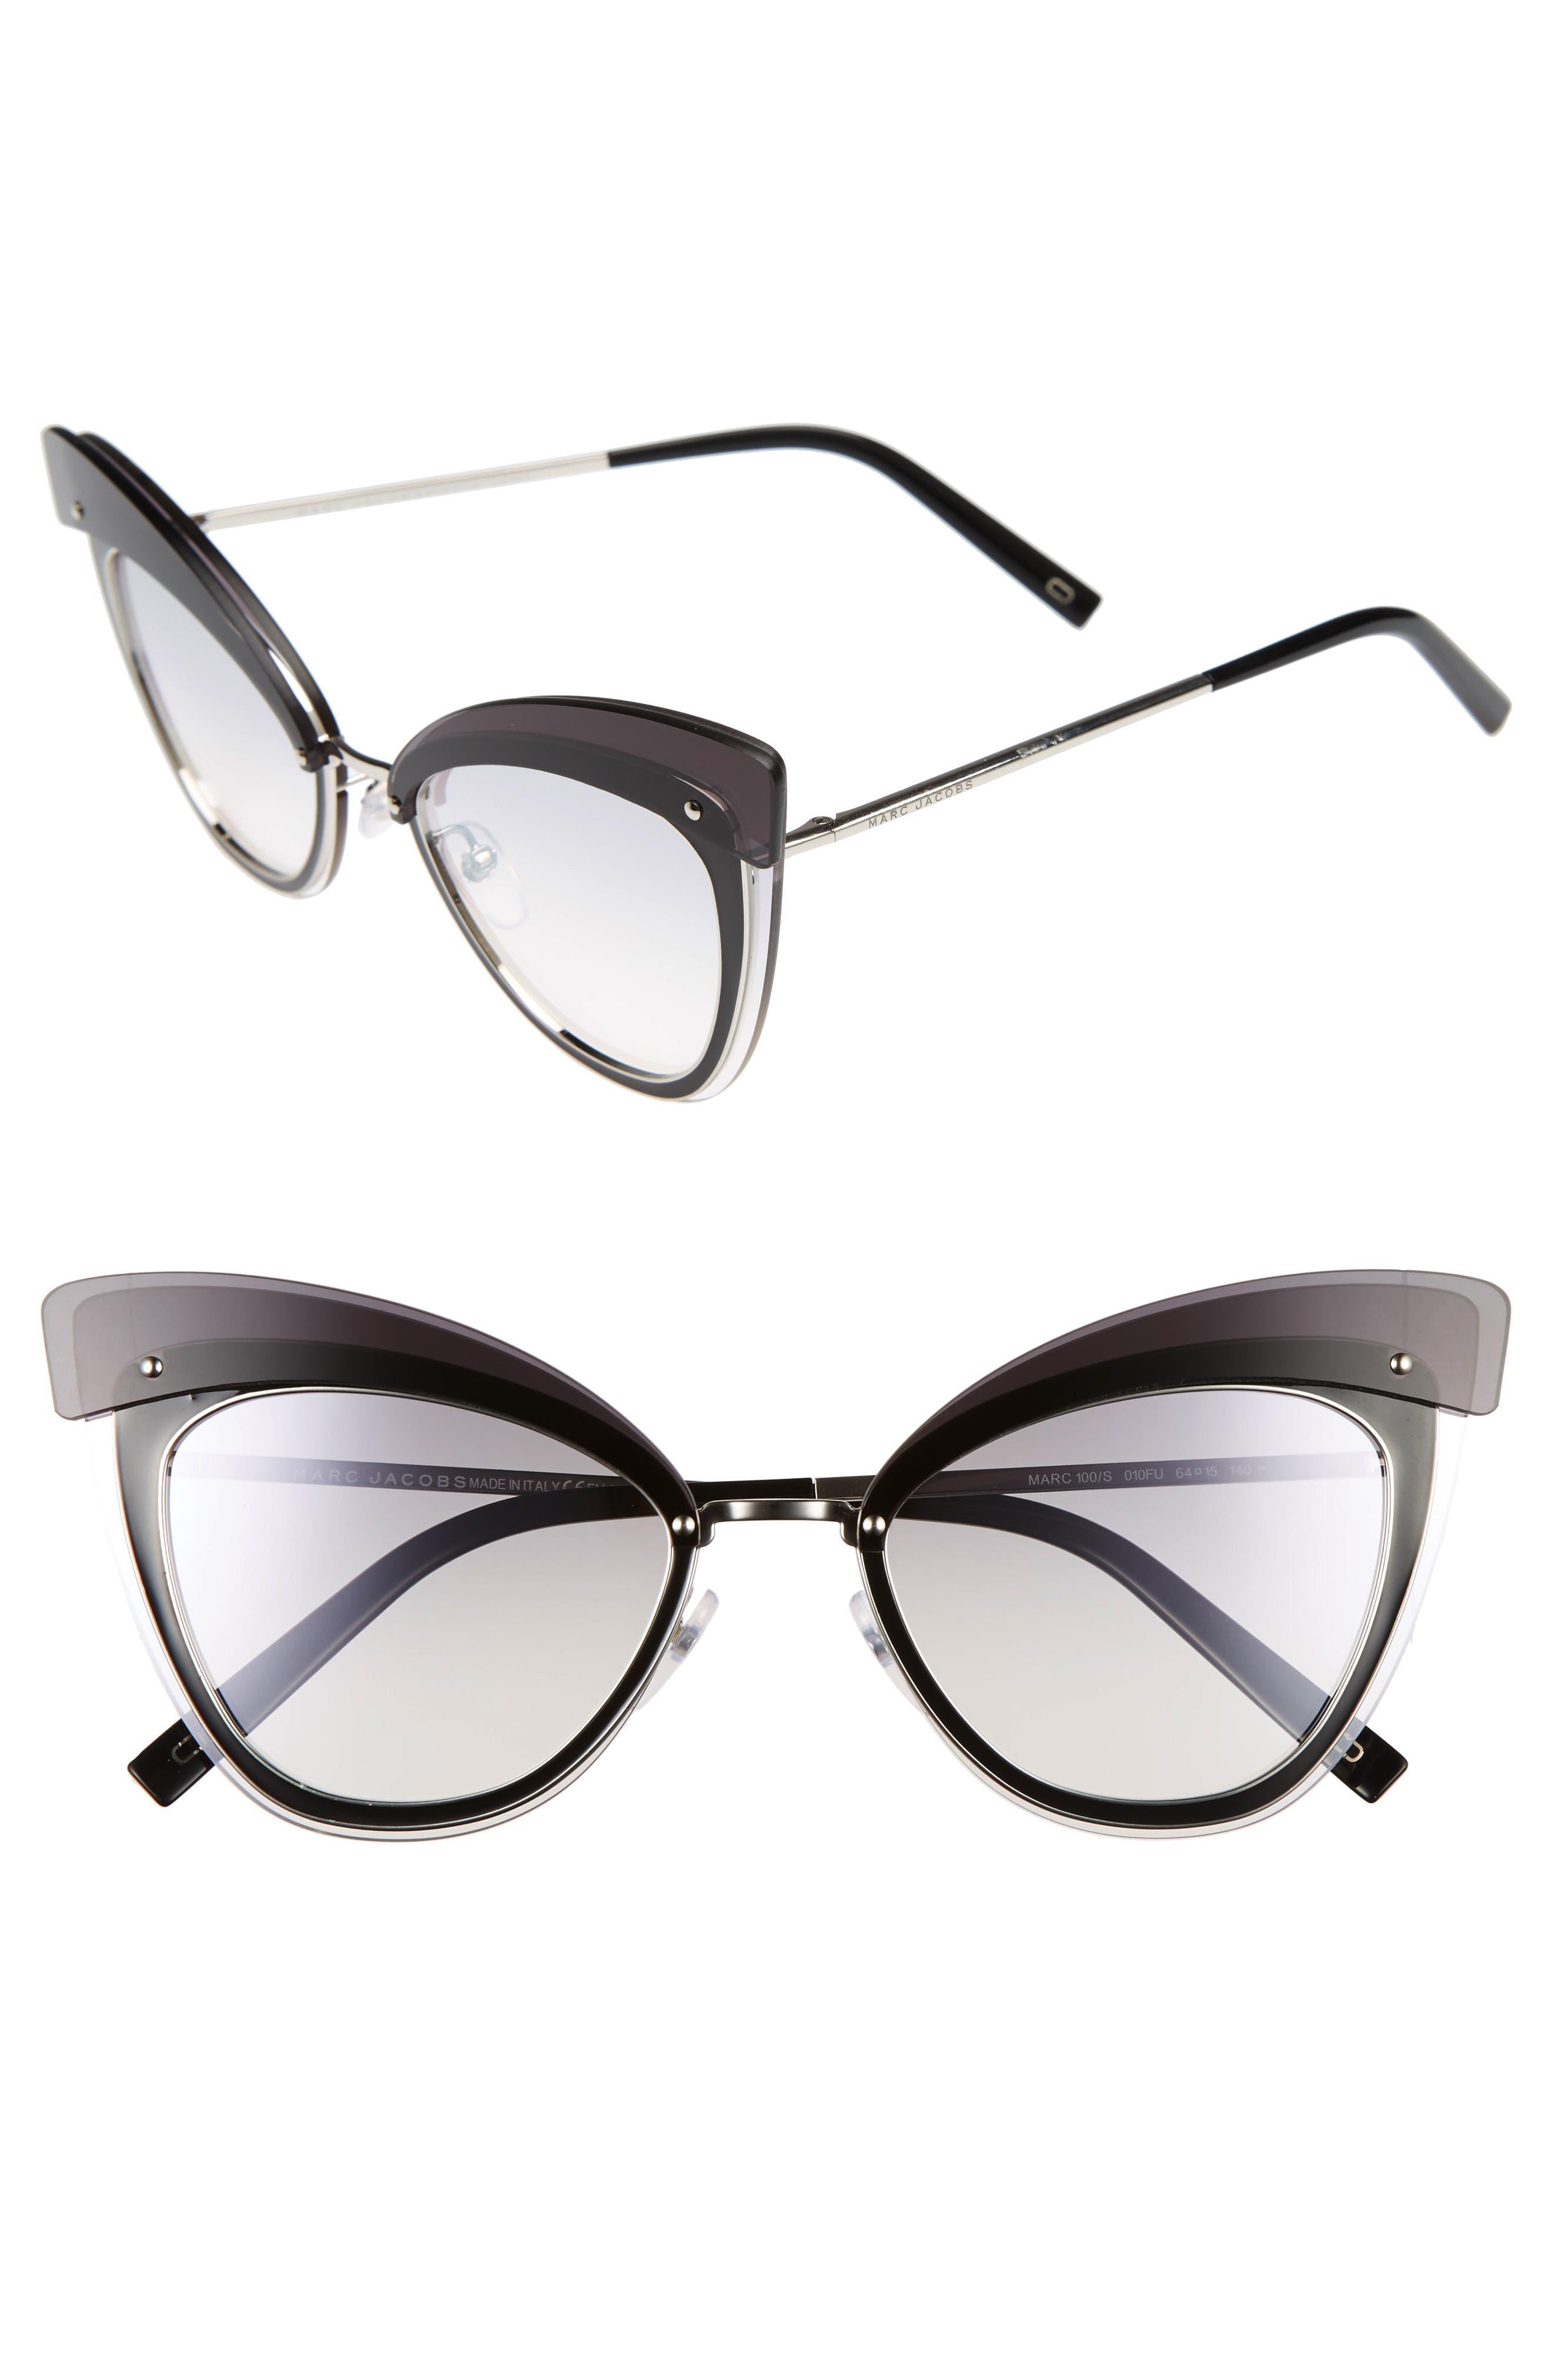 64mm Sunglasses,                         Main,                         color, 041